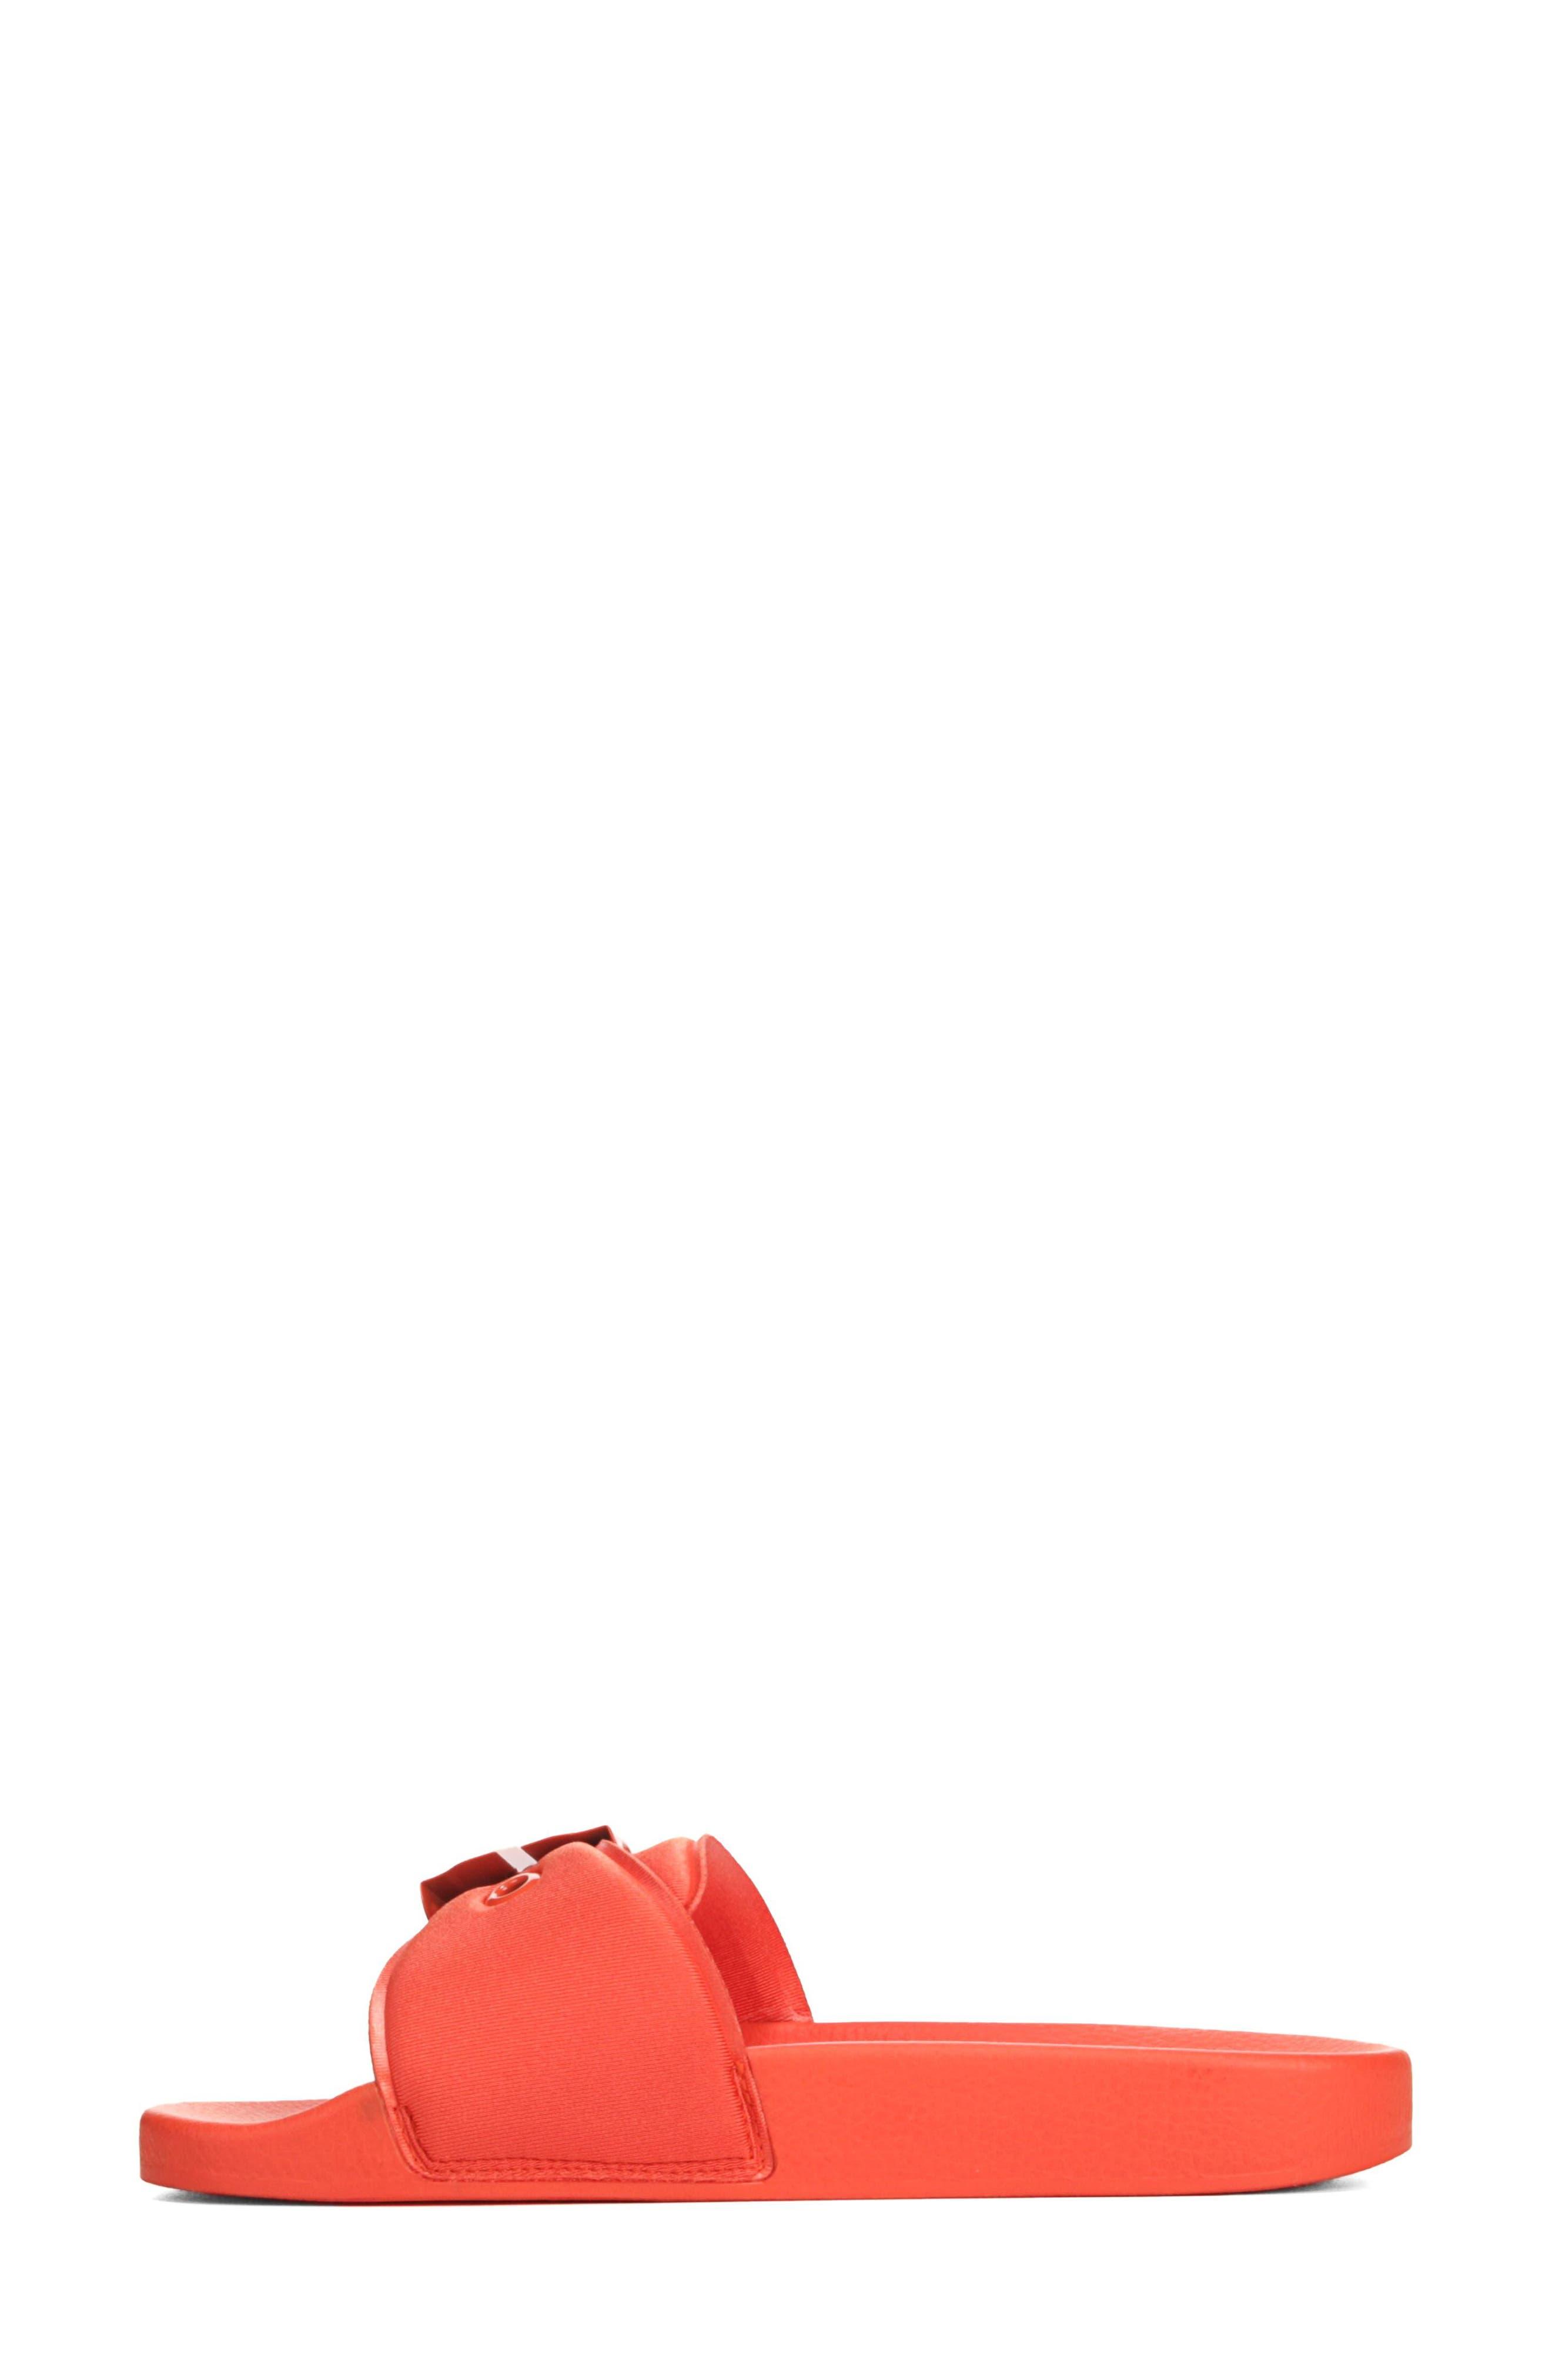 Original Pool Slide Sandal,                             Alternate thumbnail 3, color,                             TIGER LILY